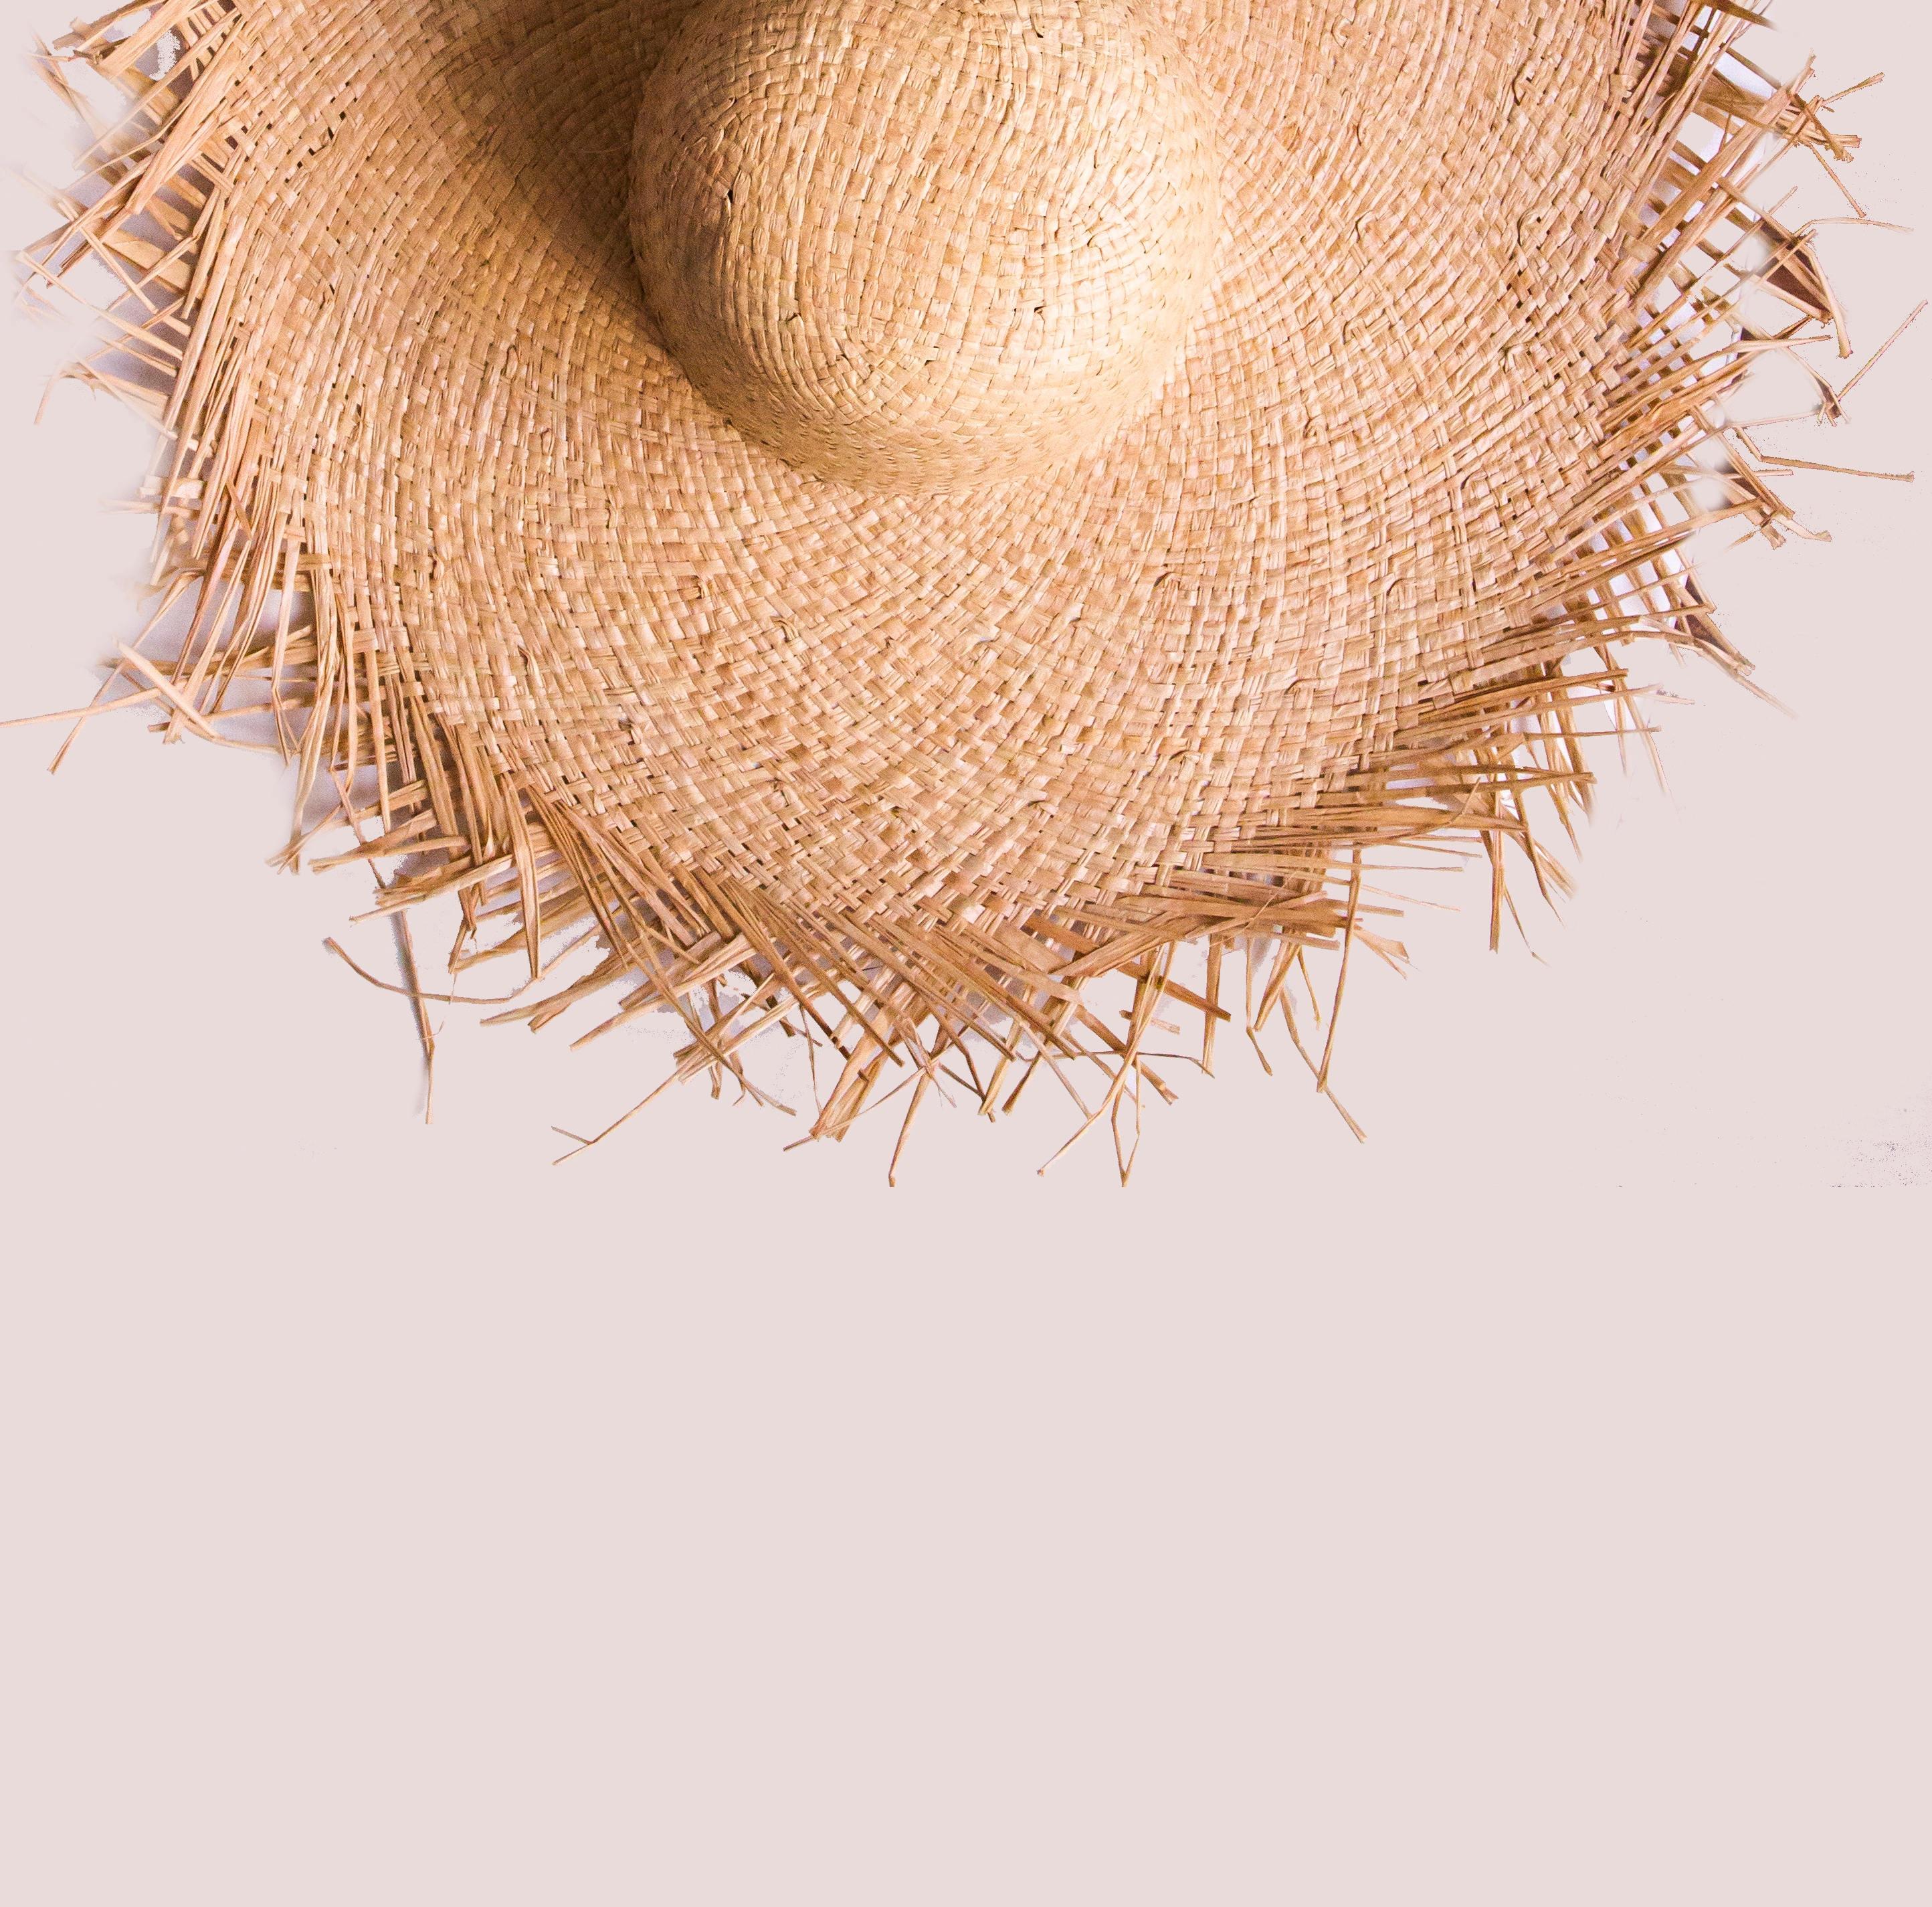 ea32c84ea591c Fringe Floppy Sun Hat Natural straw hat Personalized